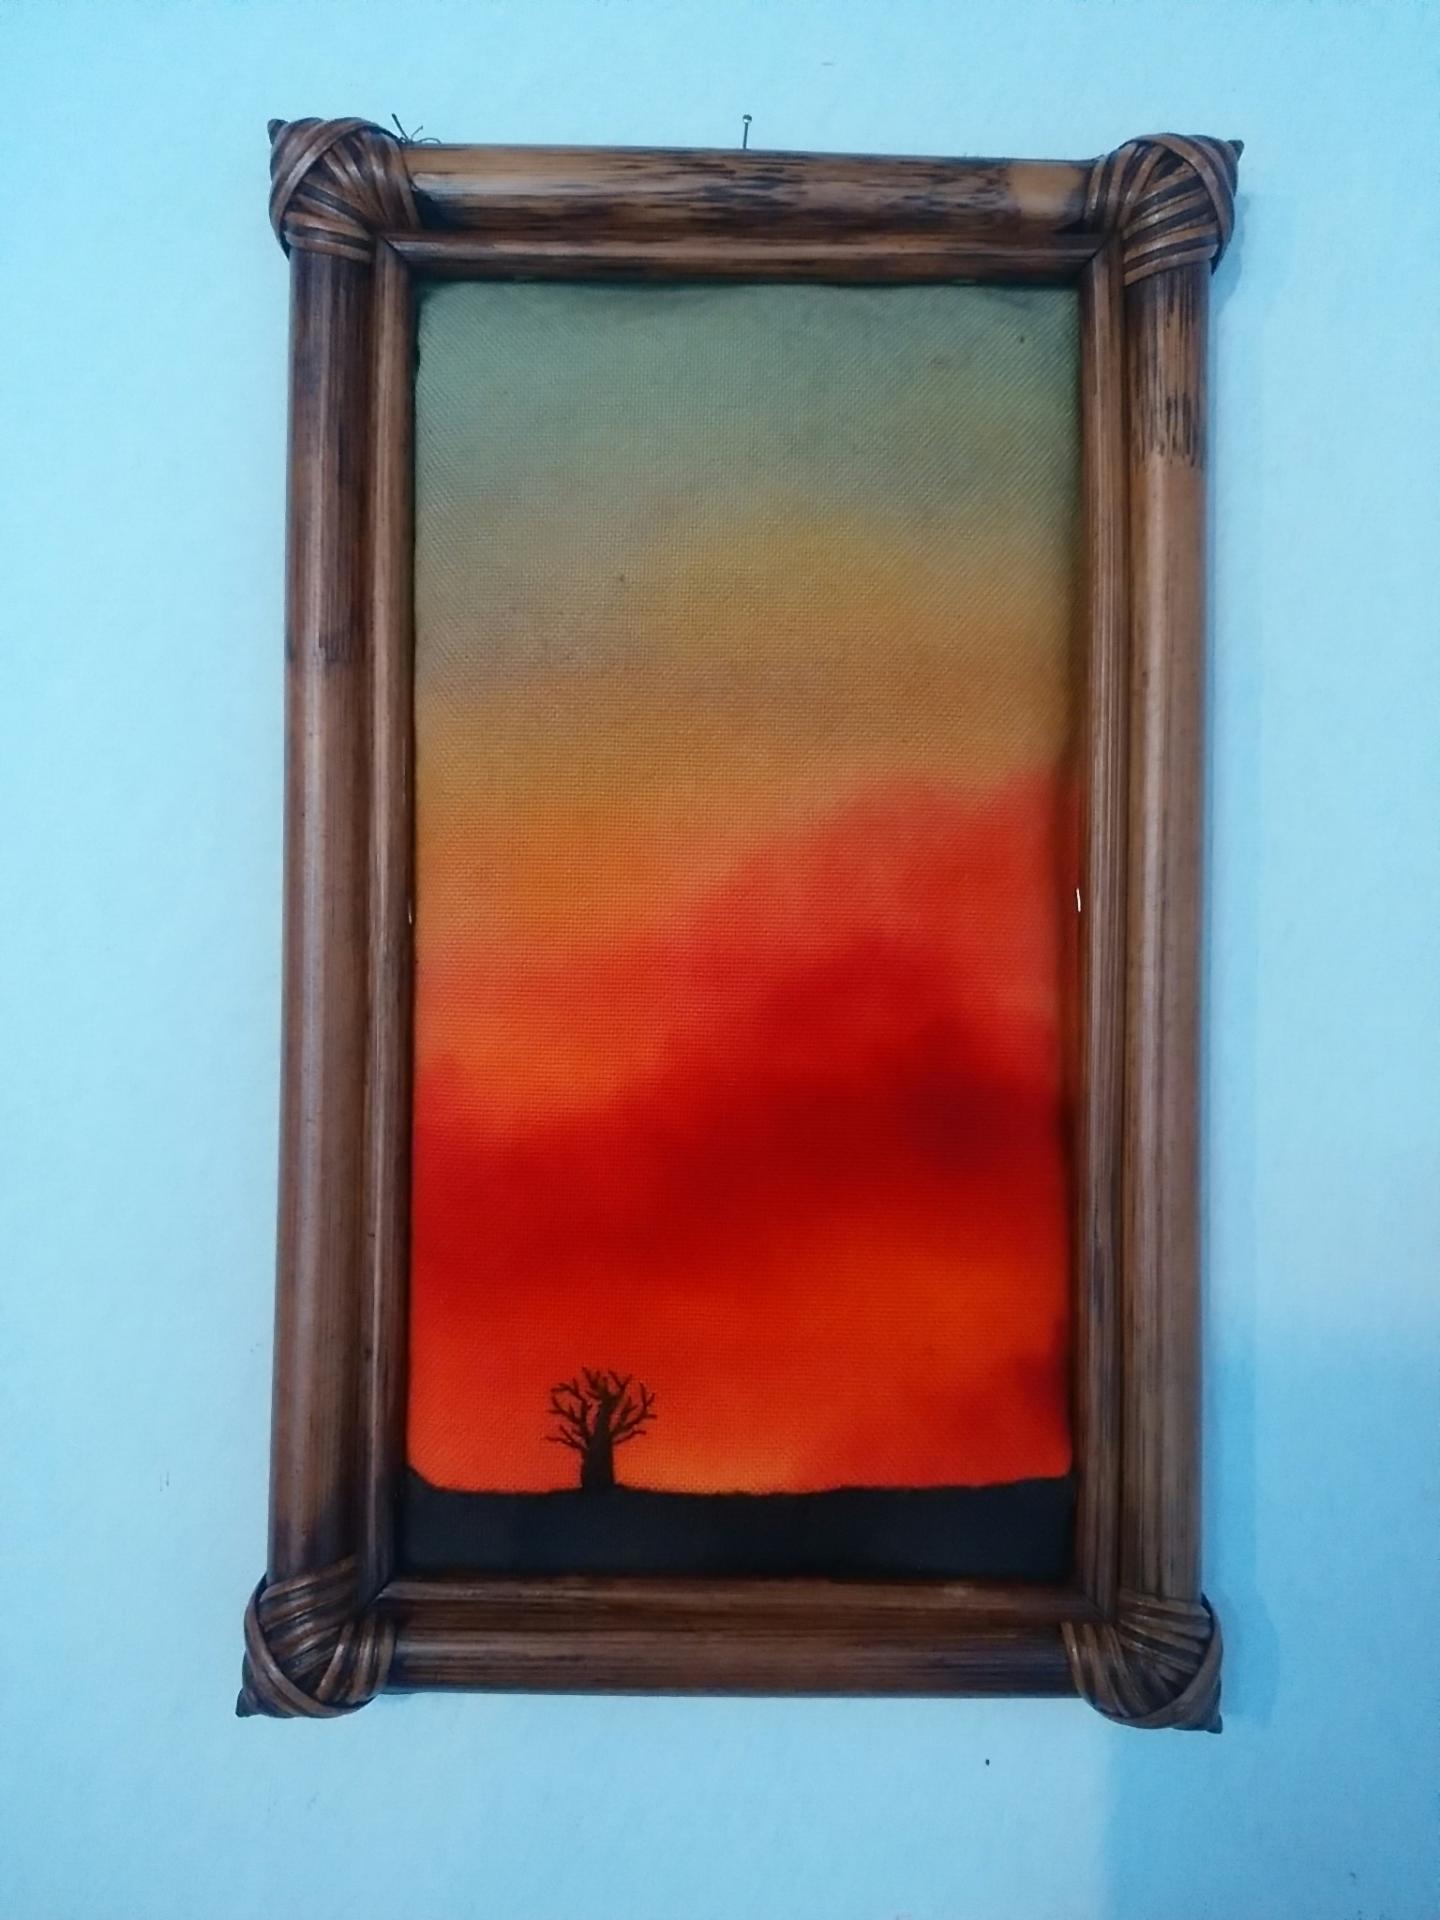 布絵 額絵 竹額 刺繍 art 空 雲 木 バオバブ 風景